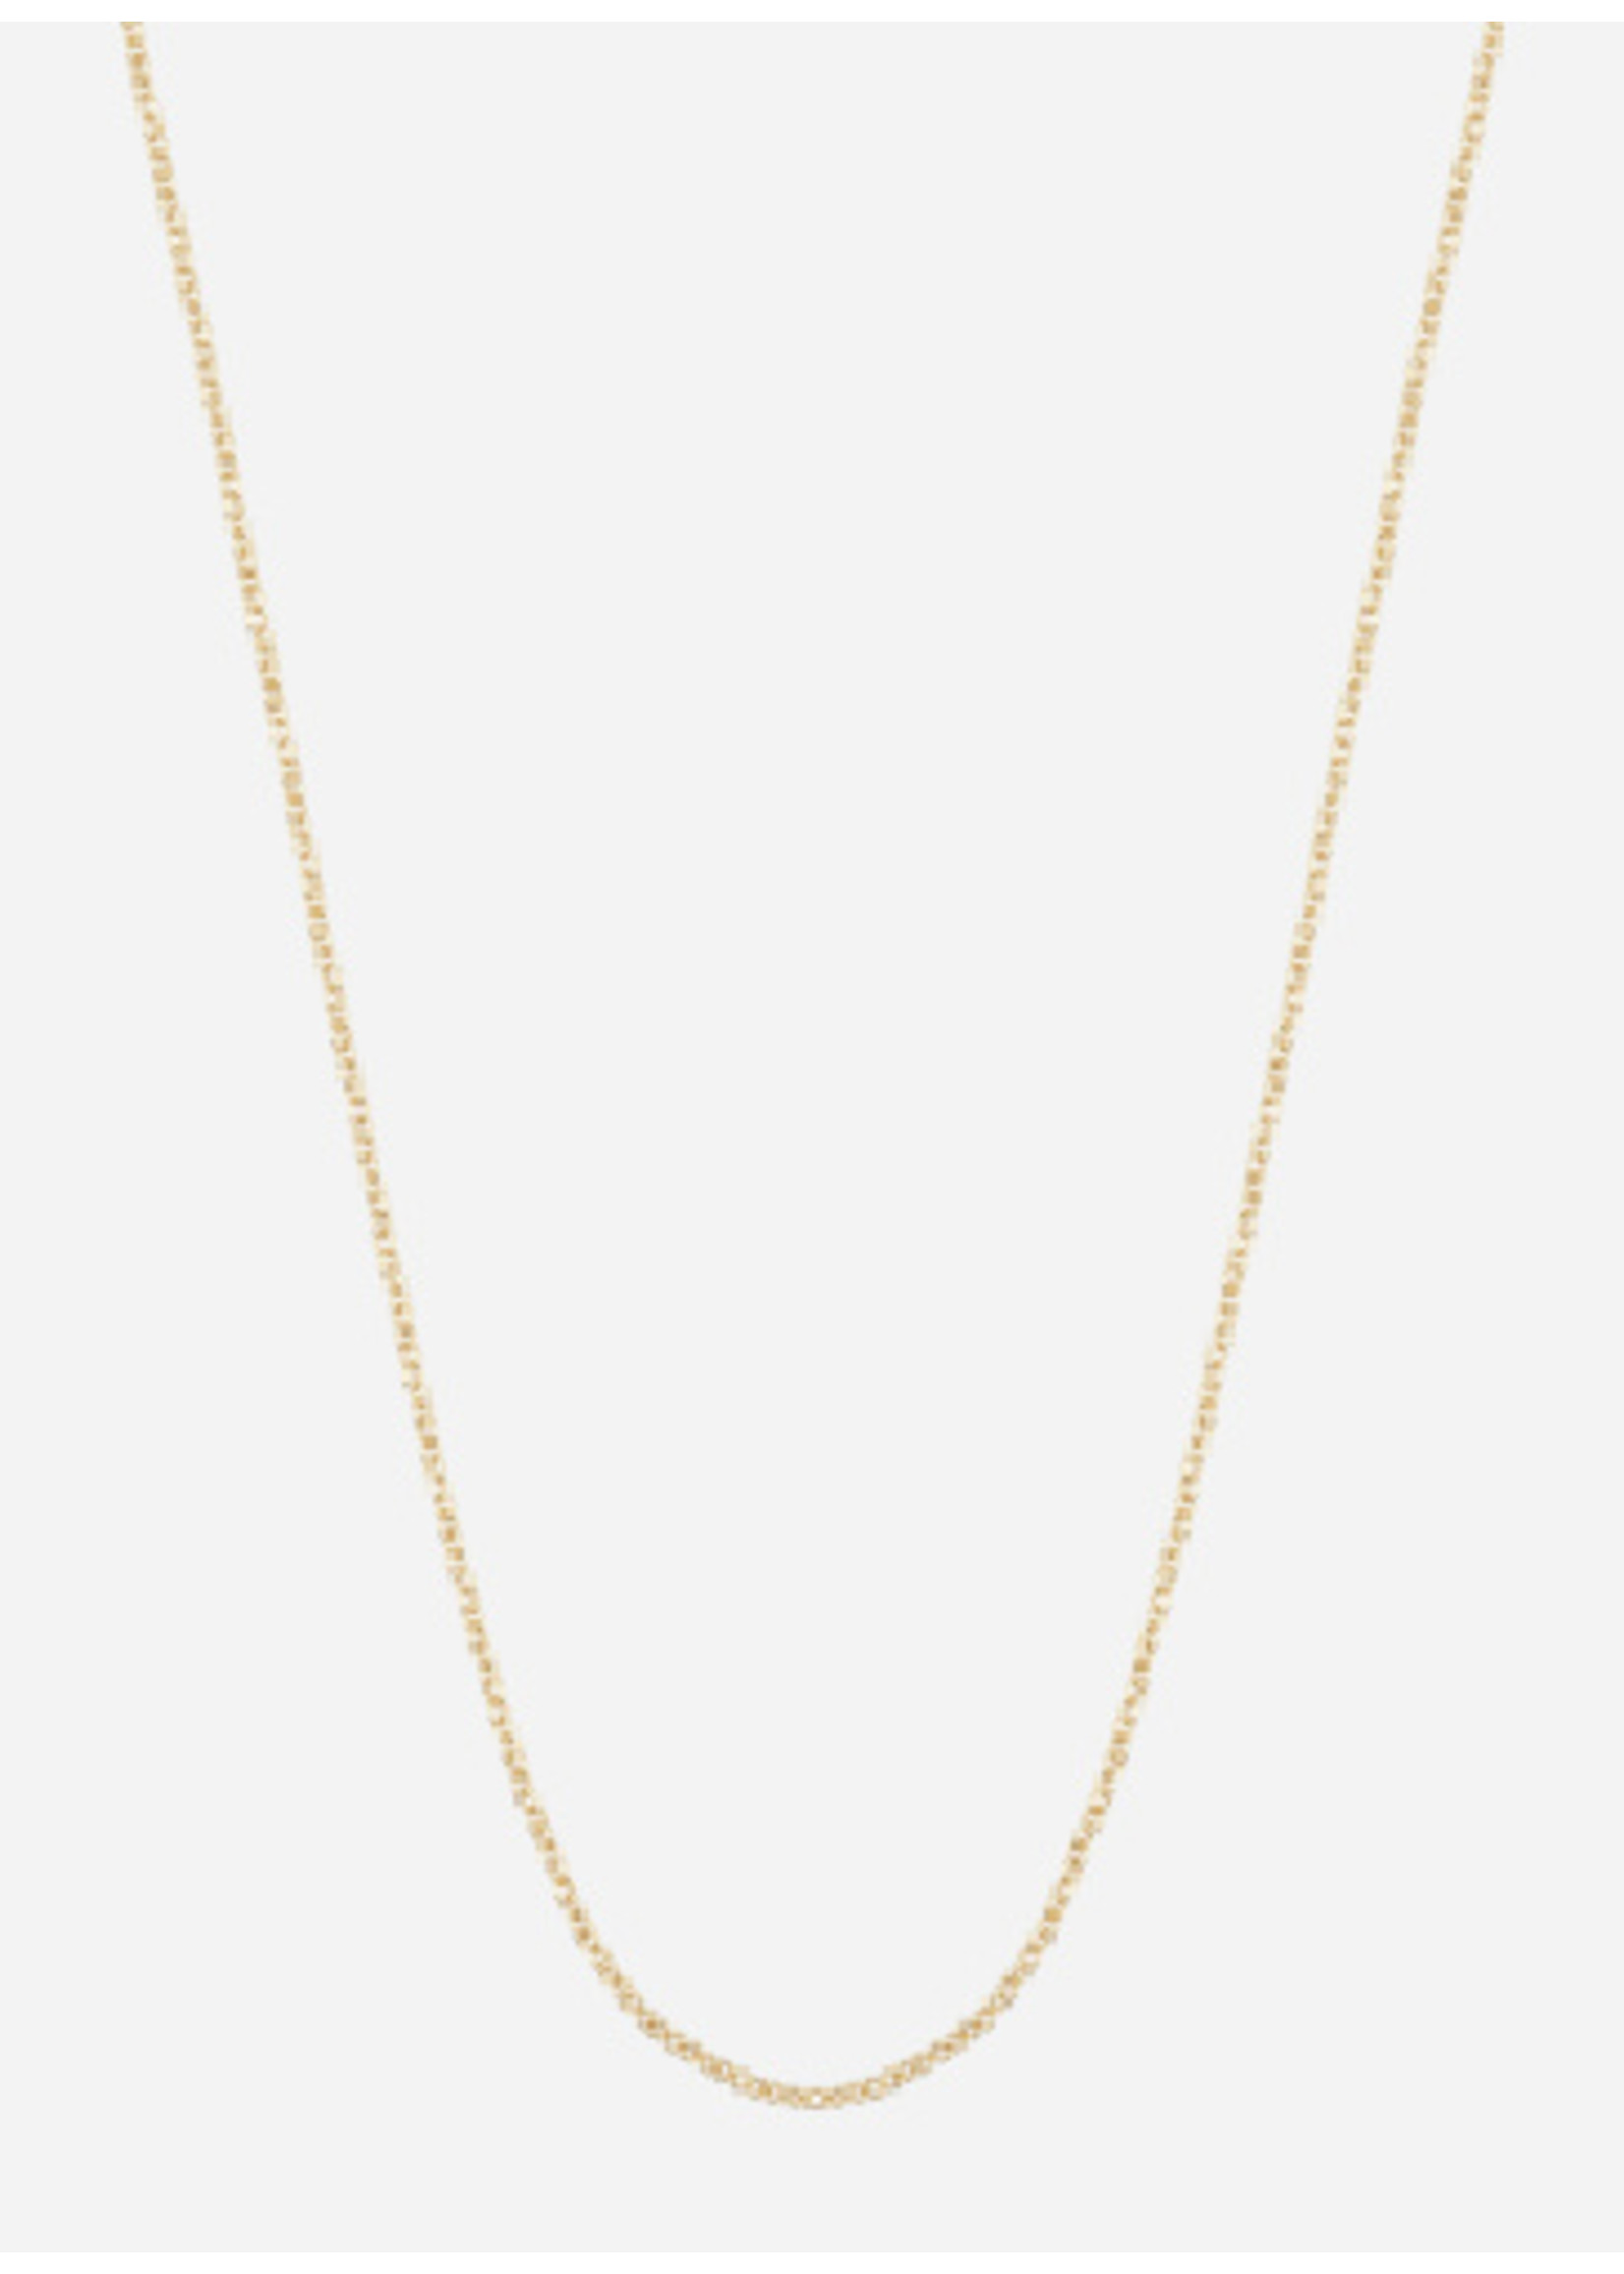 Just Franky Cube necklace plain